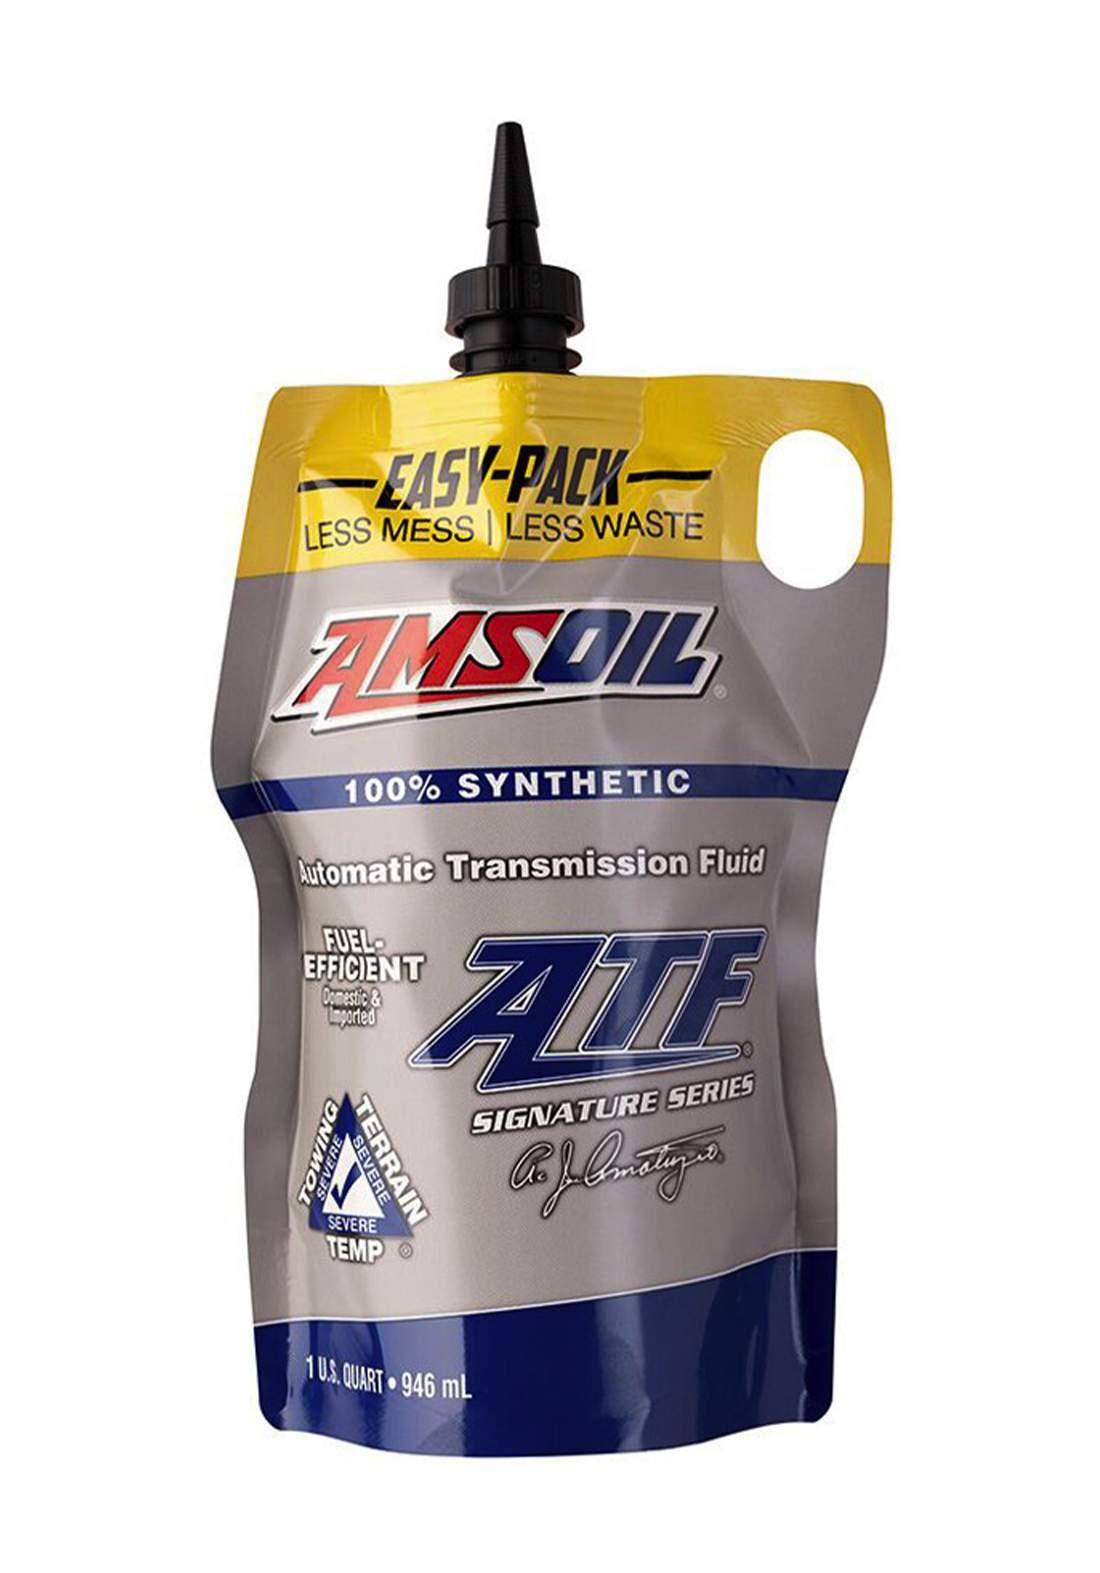 AMSOil Fuel-Efficient Synthetic Automatic Transmission Fluid (ATF) 946 ml سائل ناقل الحركة الأوتوماتيكي